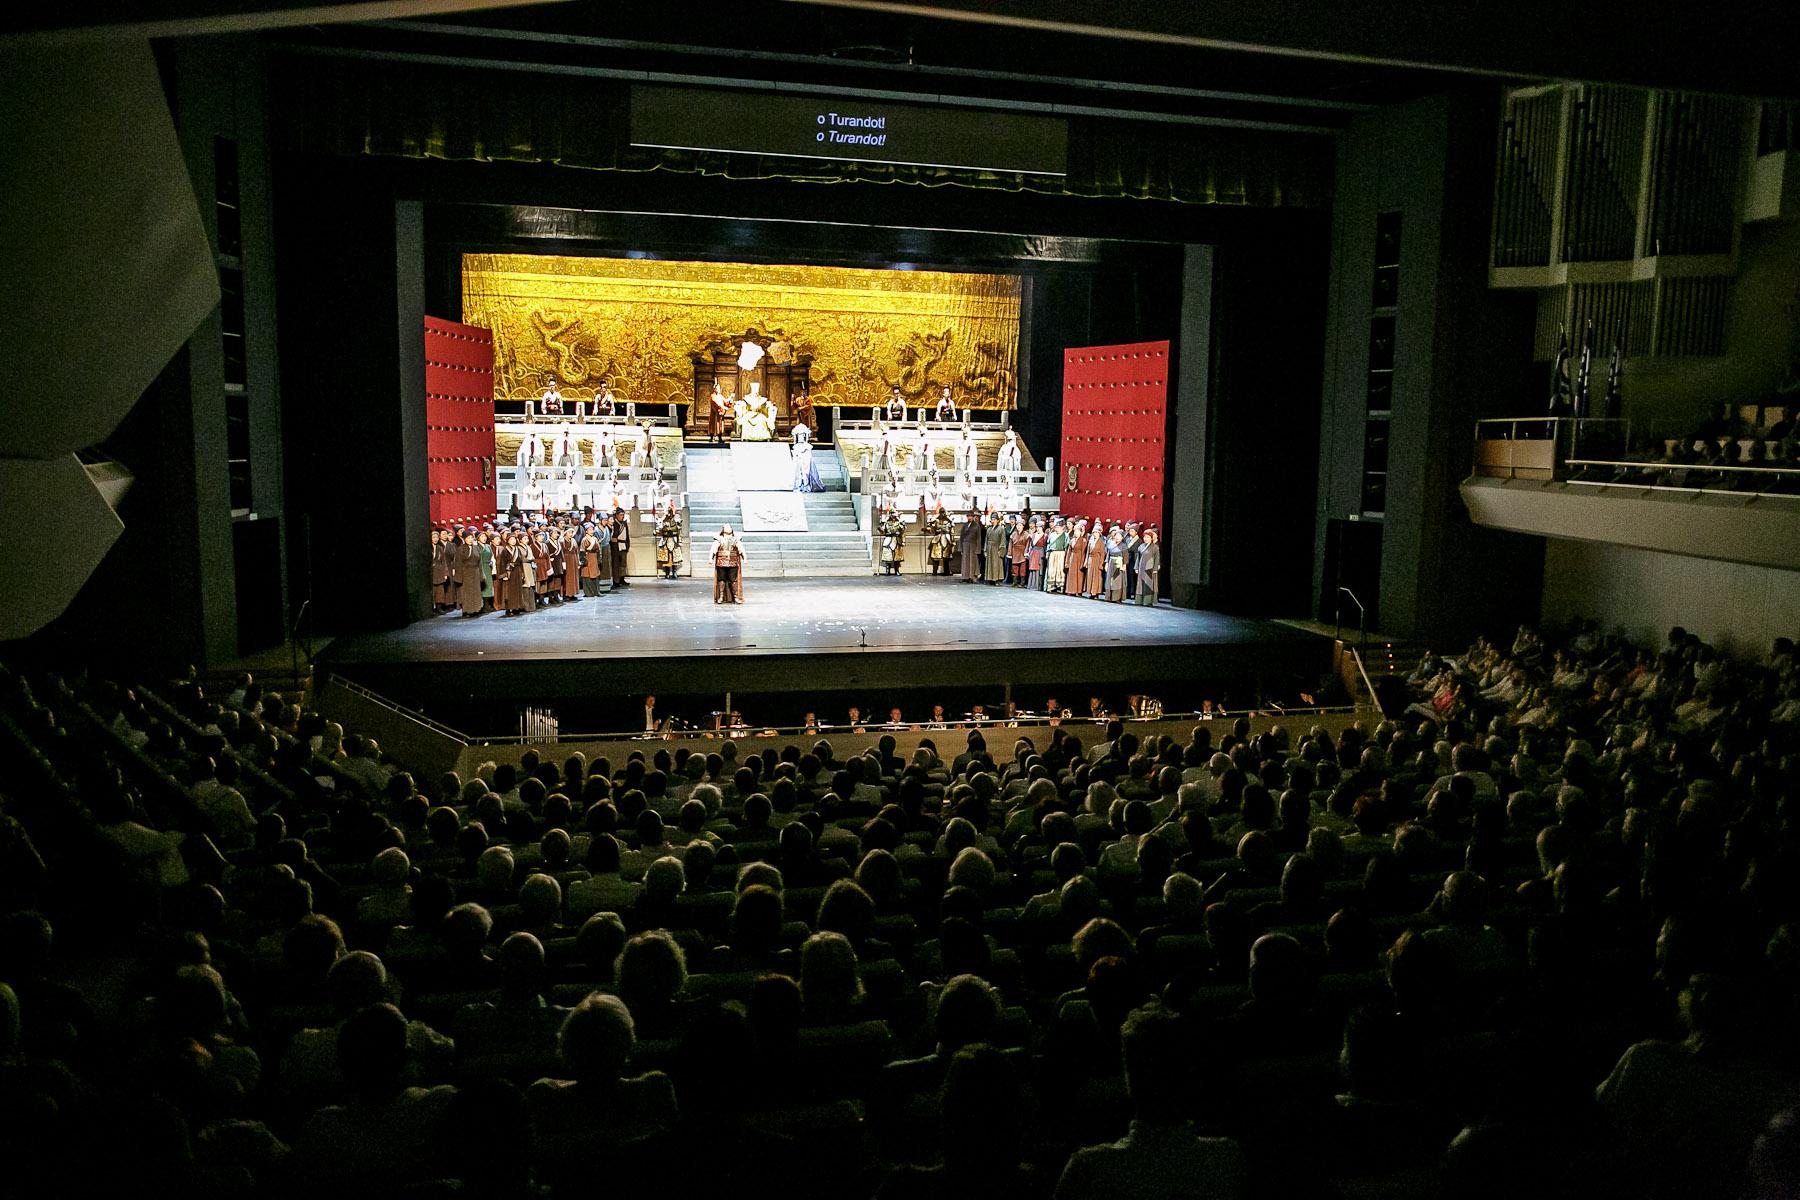 China National Opera House performs Giacomo Puccini\'s opera Turandot in Cankarjev dom Cultural & Congress center in Ljubljana, Slovenia, Sep. 1, 2015.